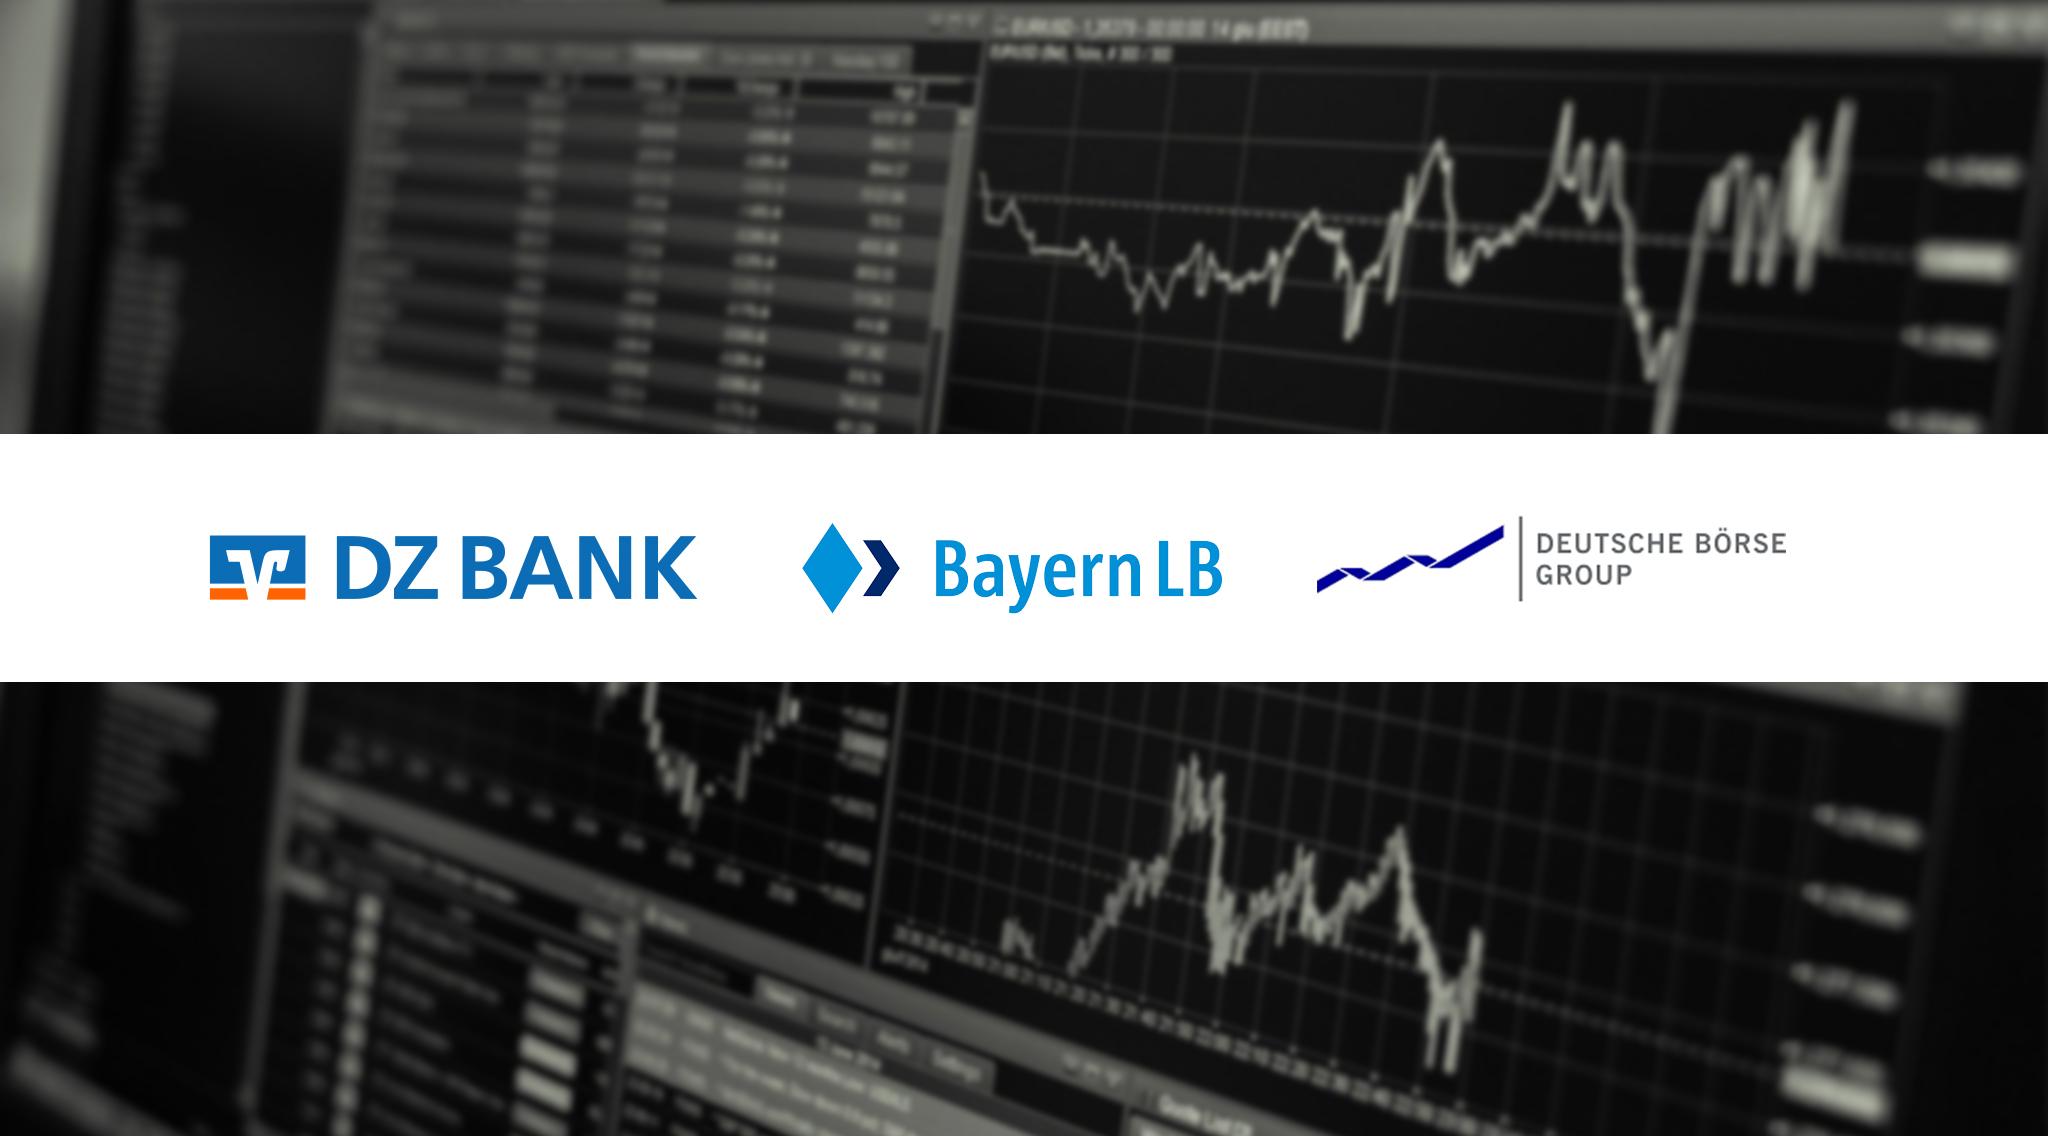 DZ Bank, BayernLB and Deutsche Börse Prove Functionality of Digital Smart Derivative Contracts